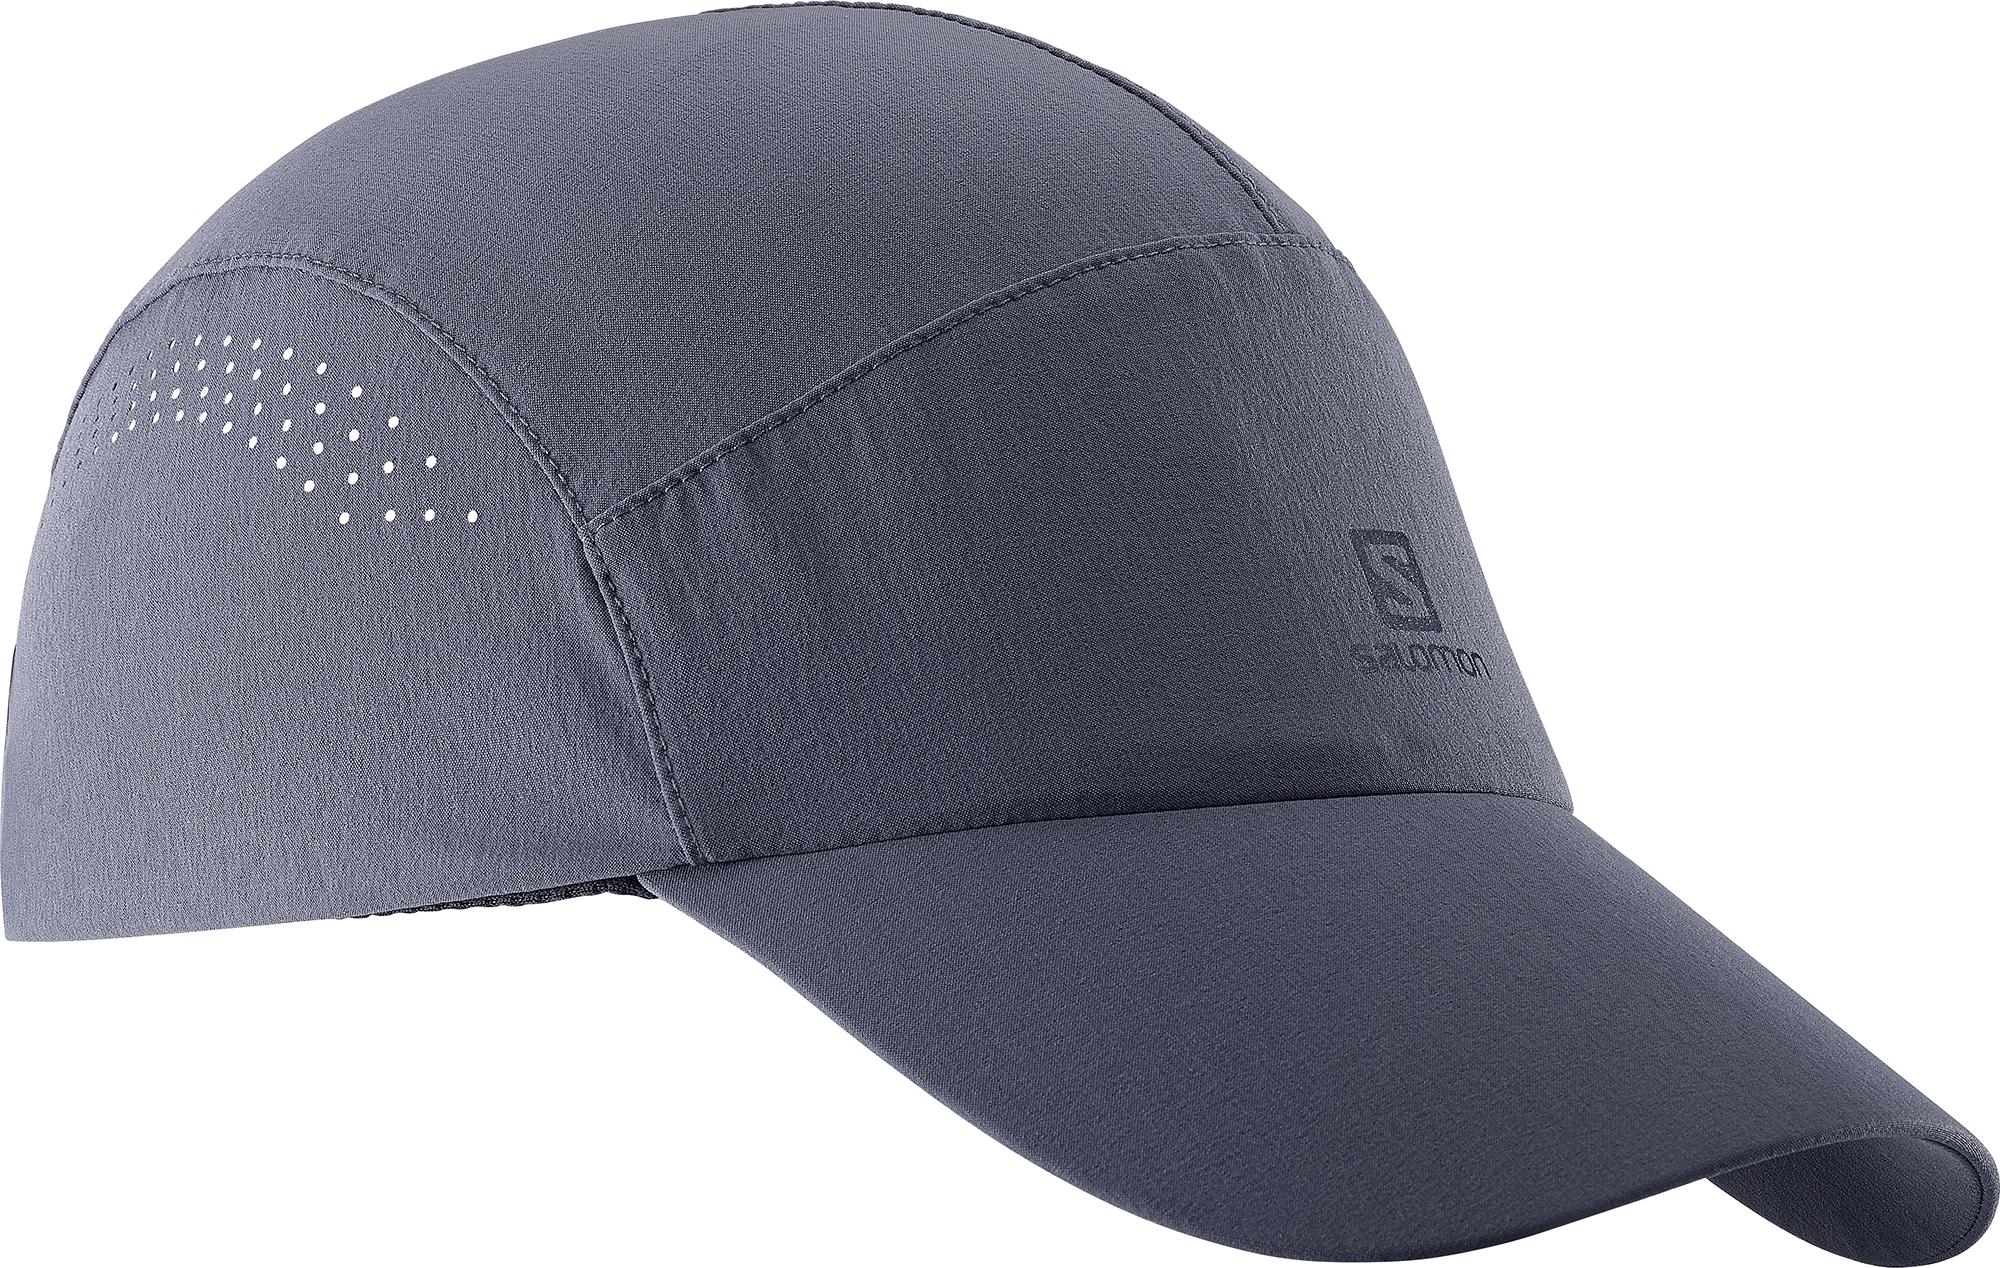 Salomon Softshell Cap Ombre Blue 393182 šedá